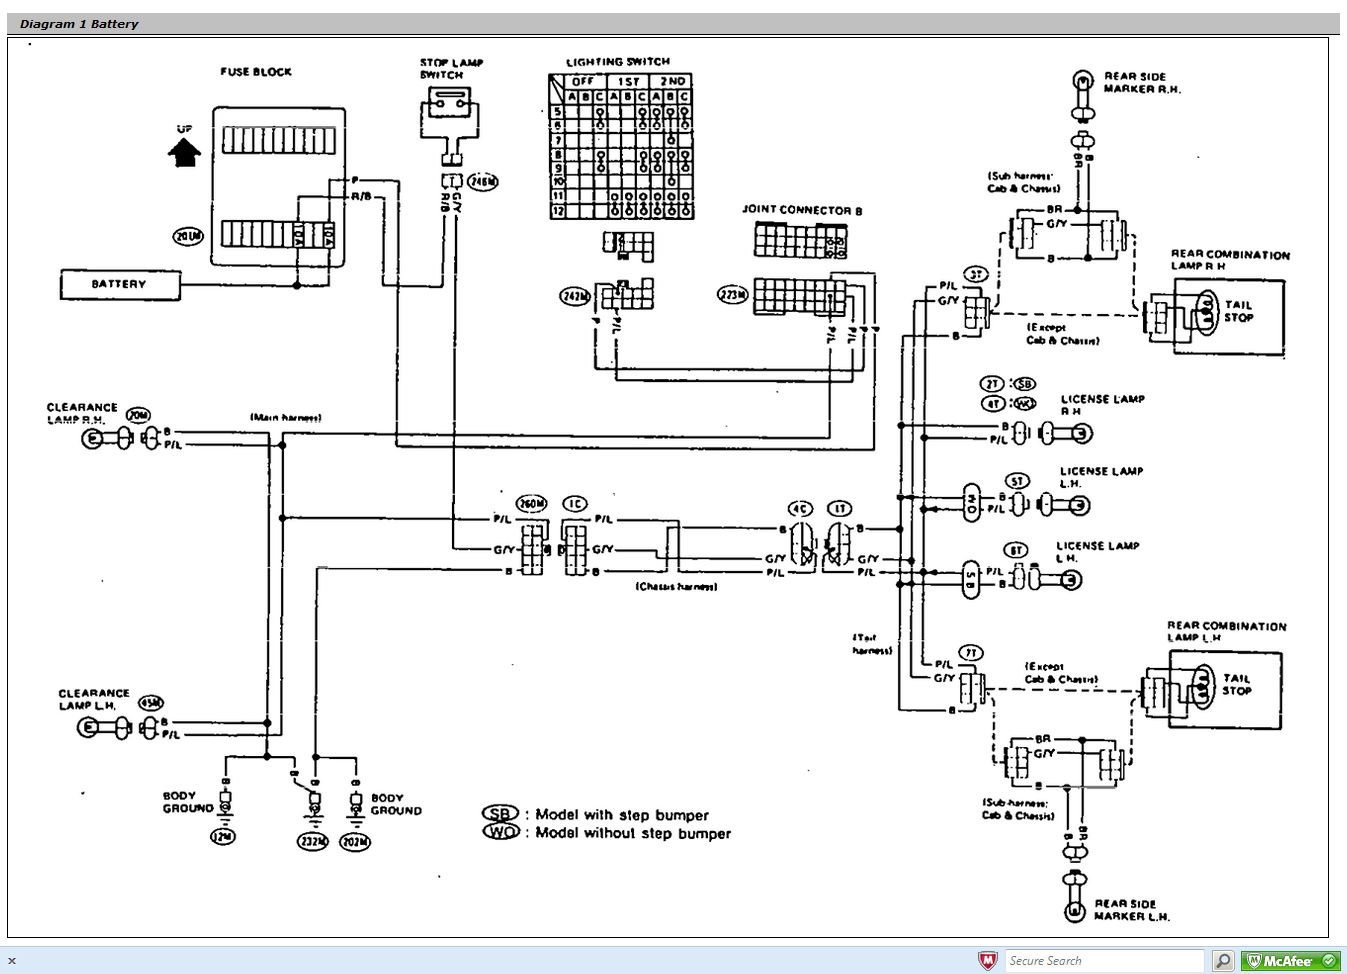 2007 Ford Ranger Fuse Box Diagram